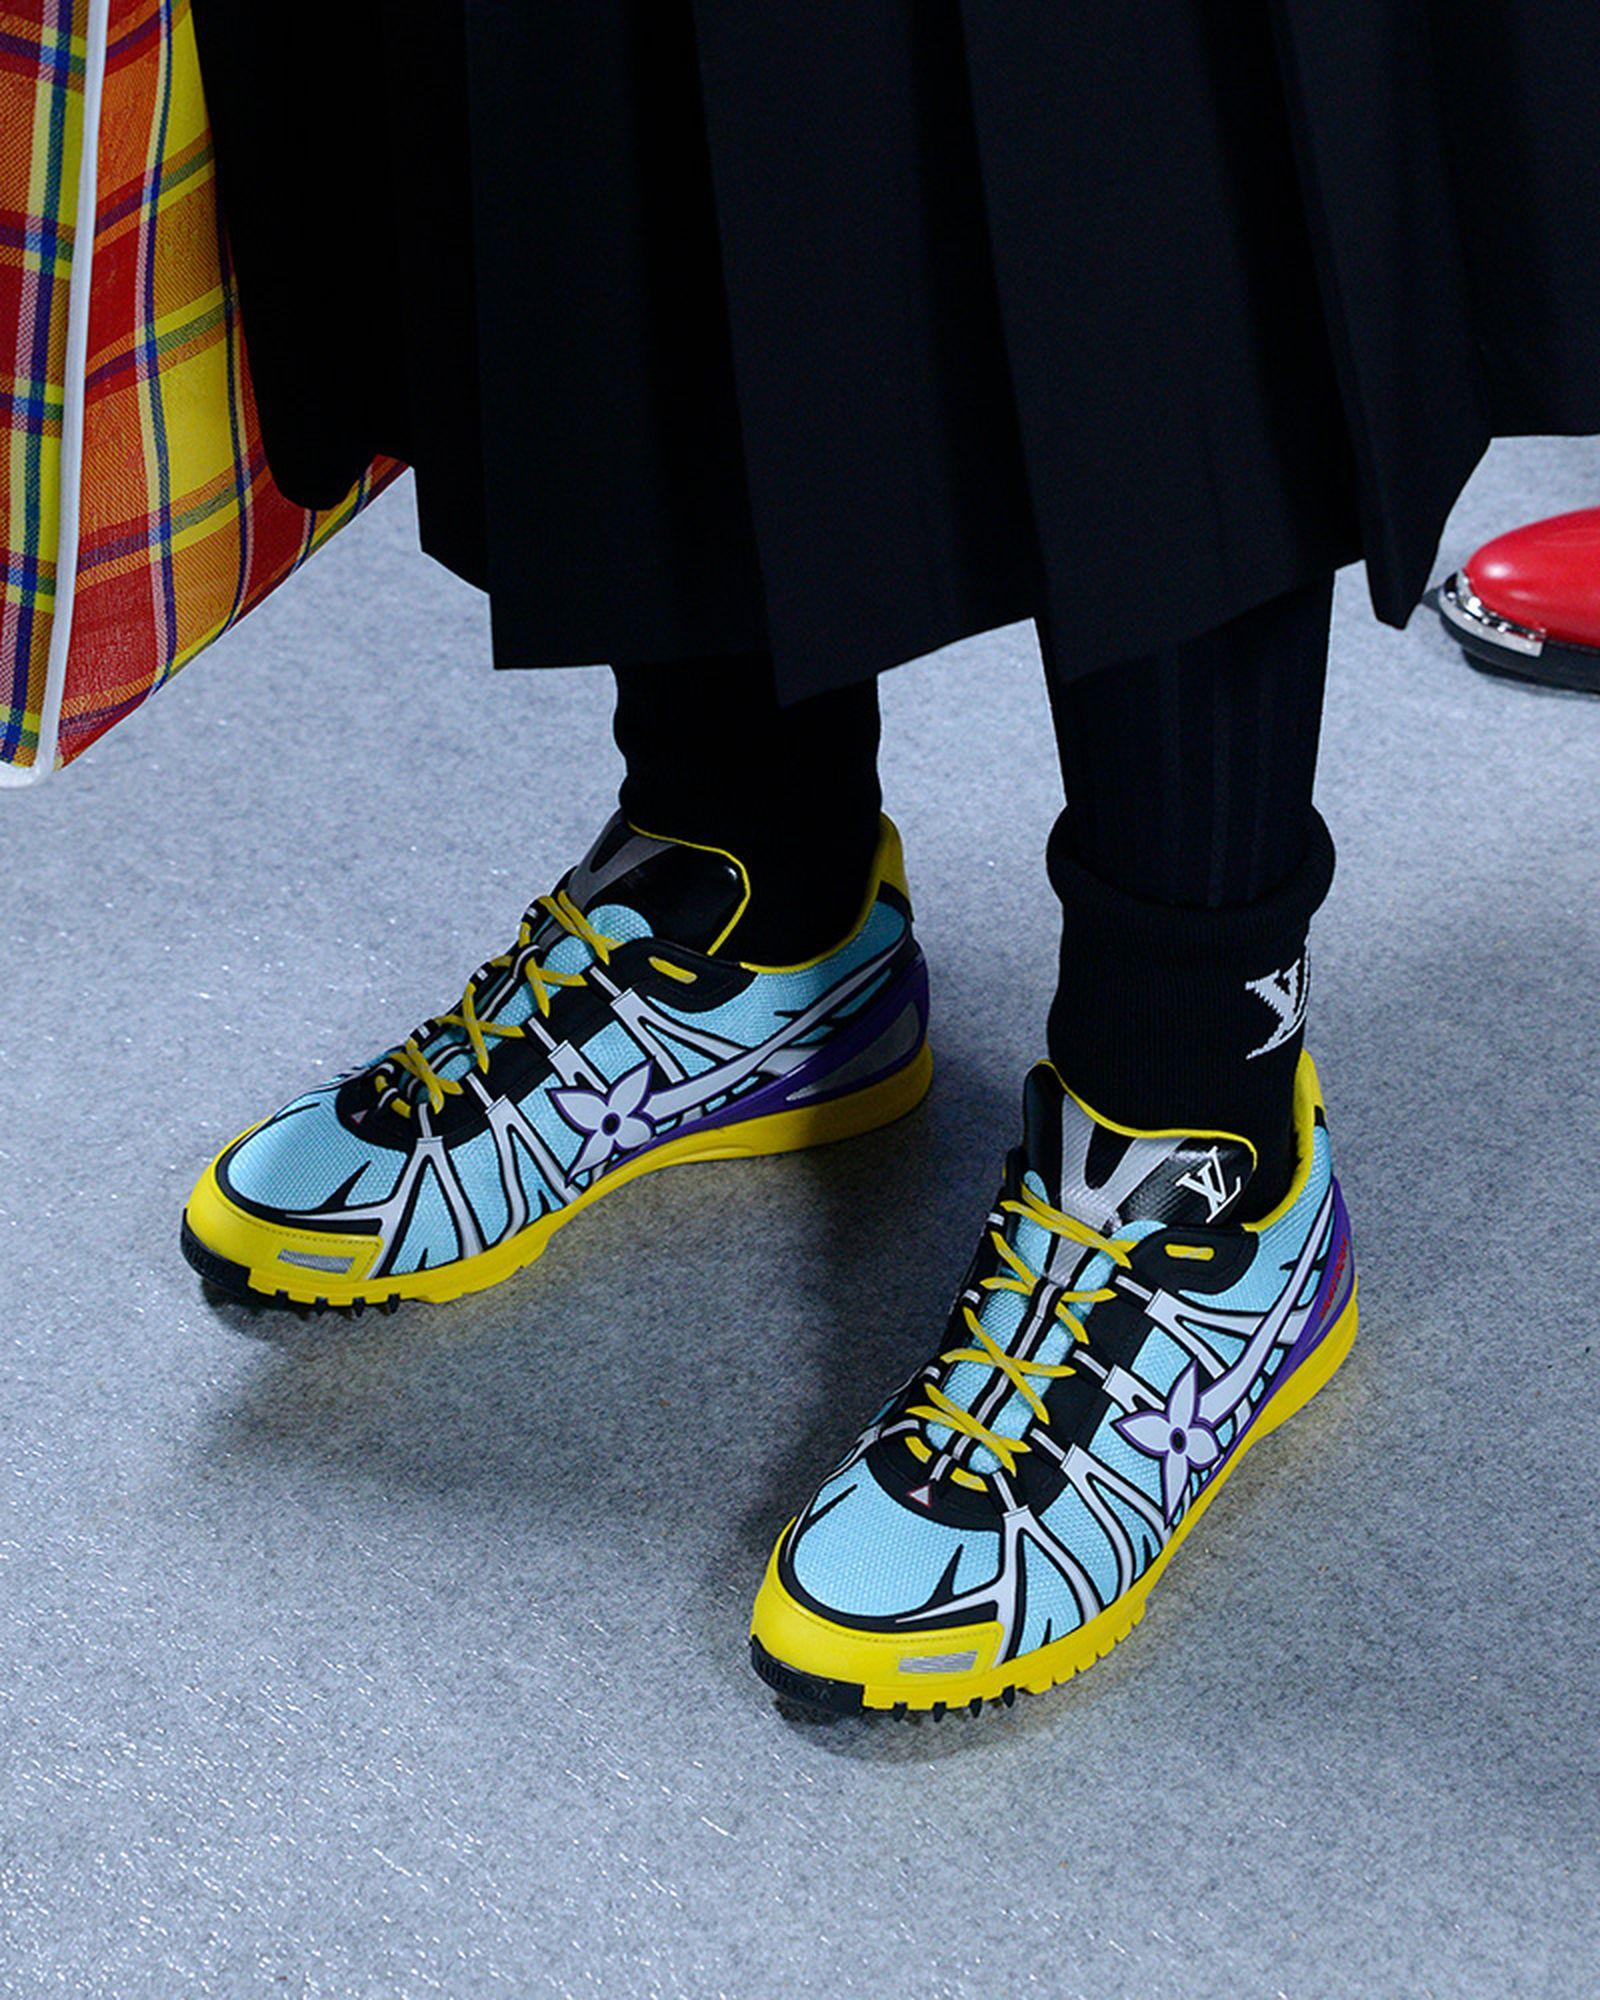 paris-fashion-week-fw21-sneaker-roundup-louis-vuitton-02